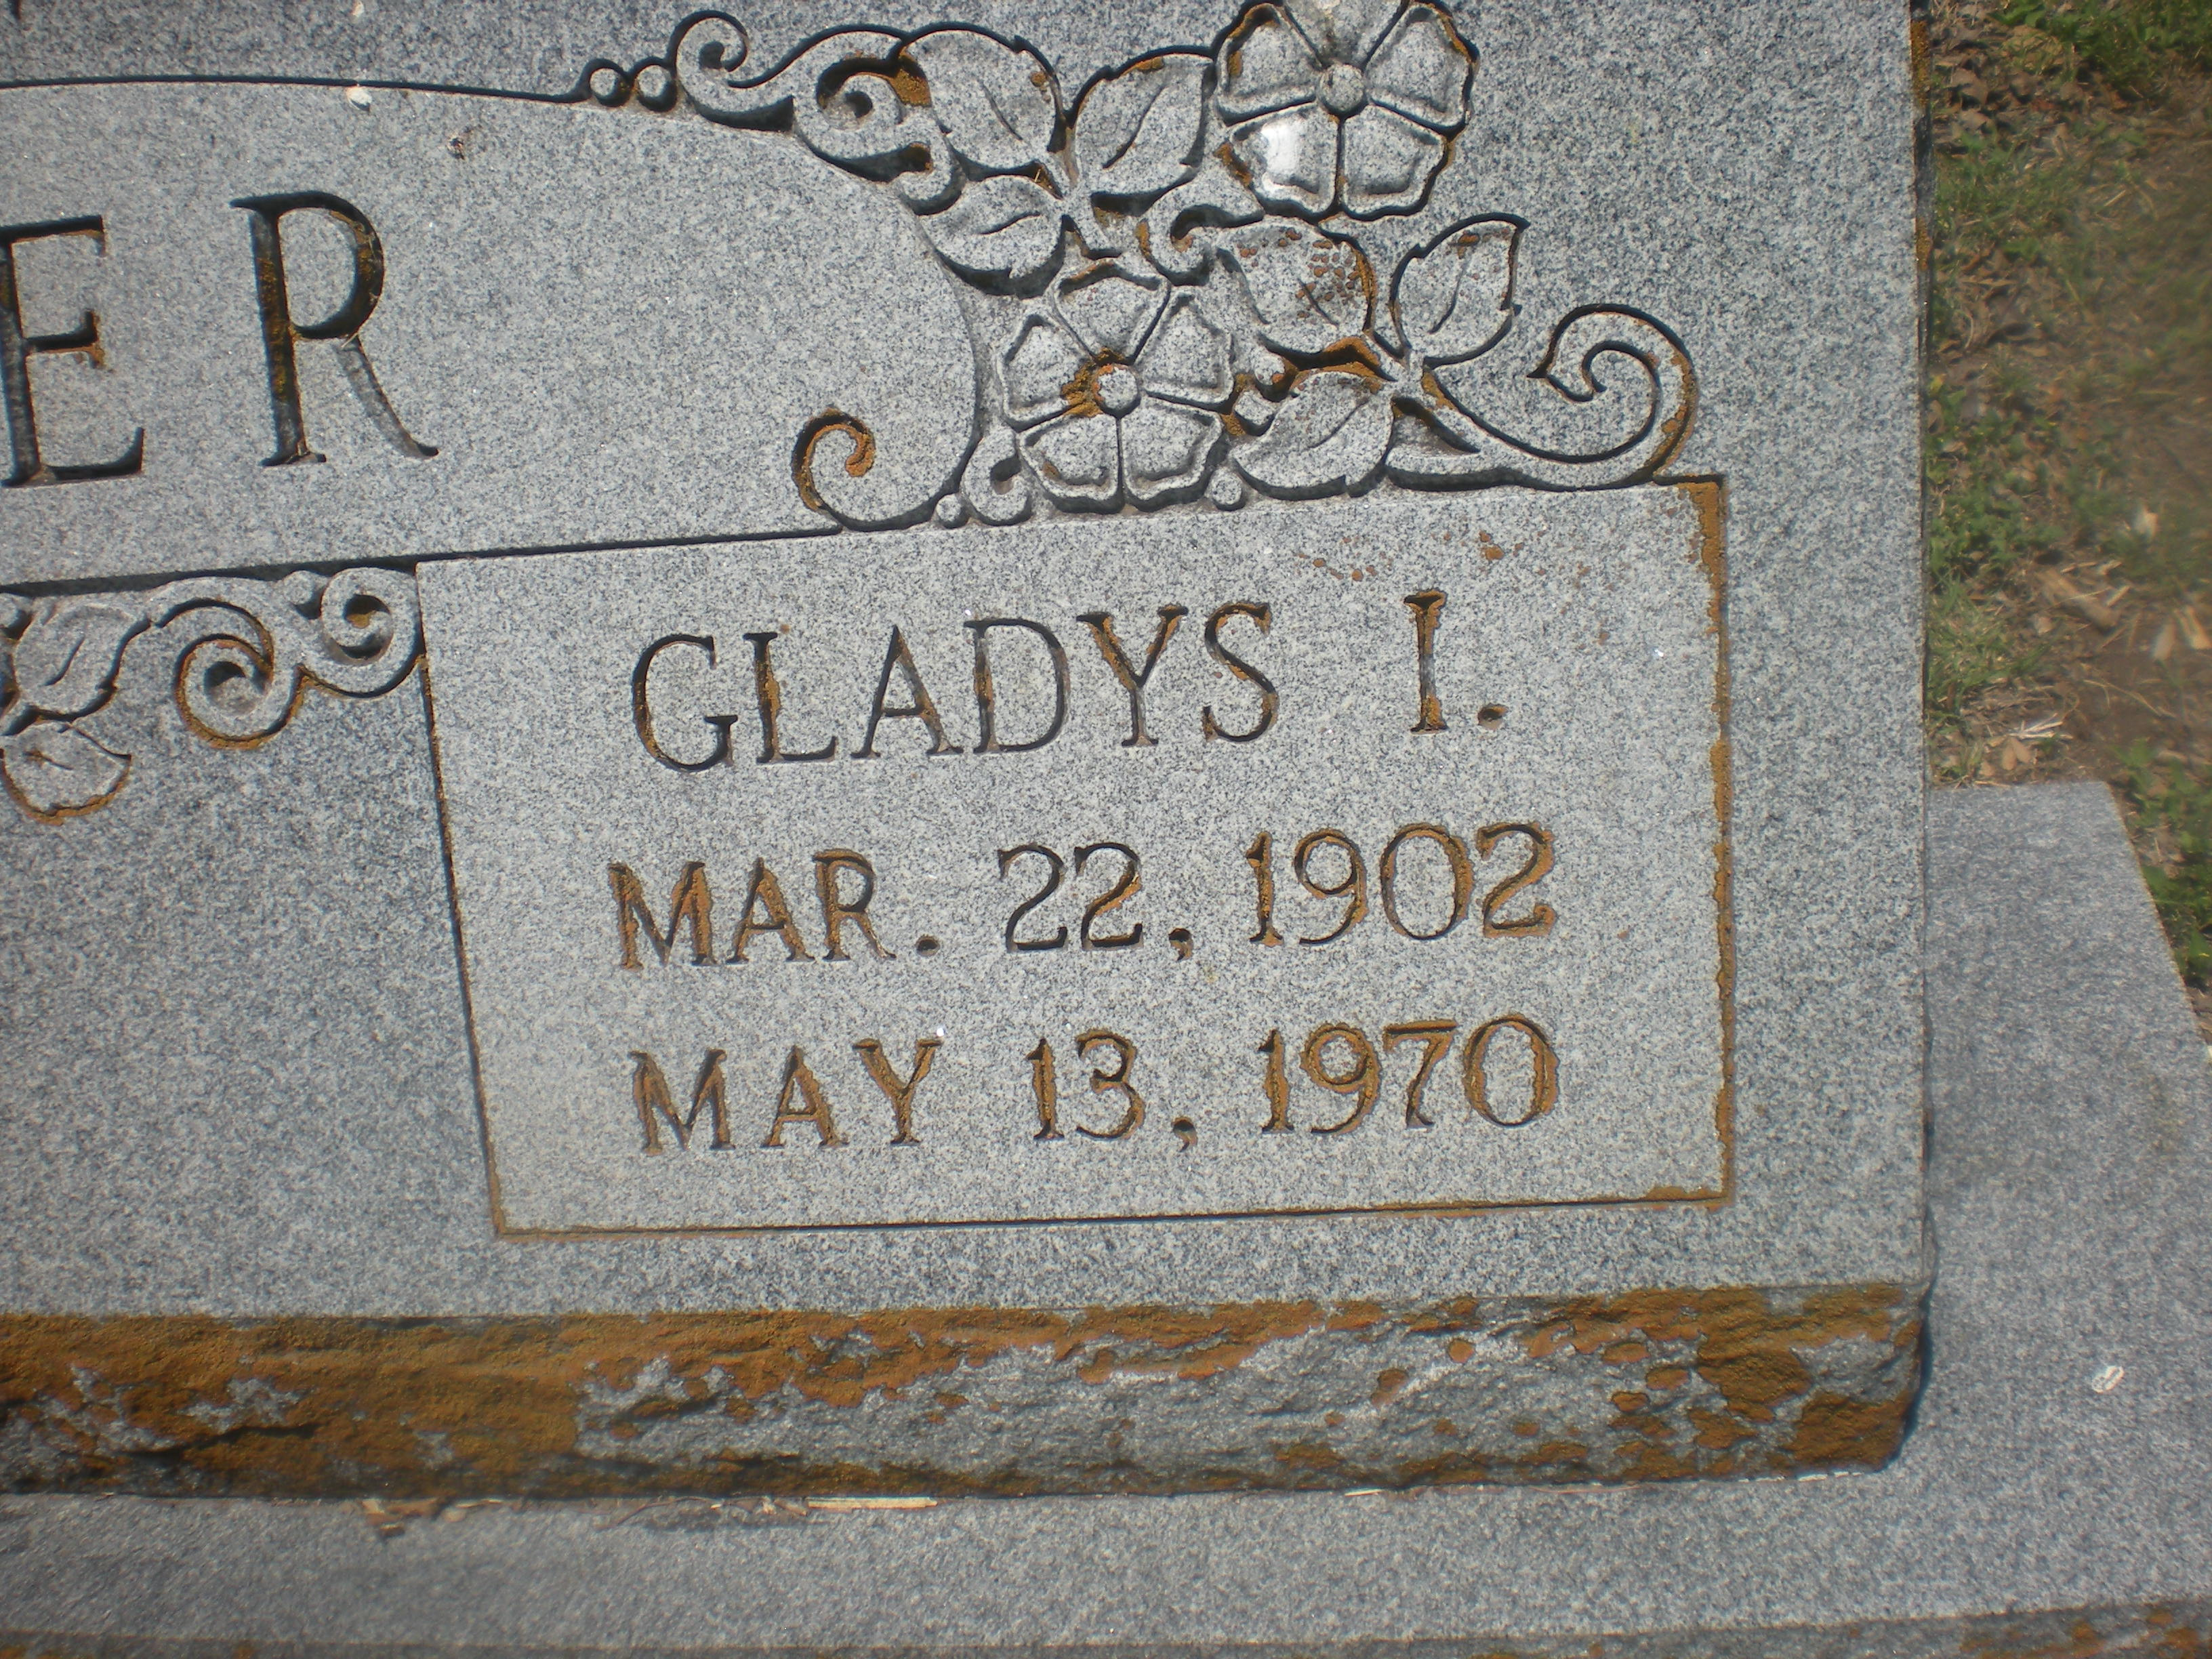 Gladys Adler